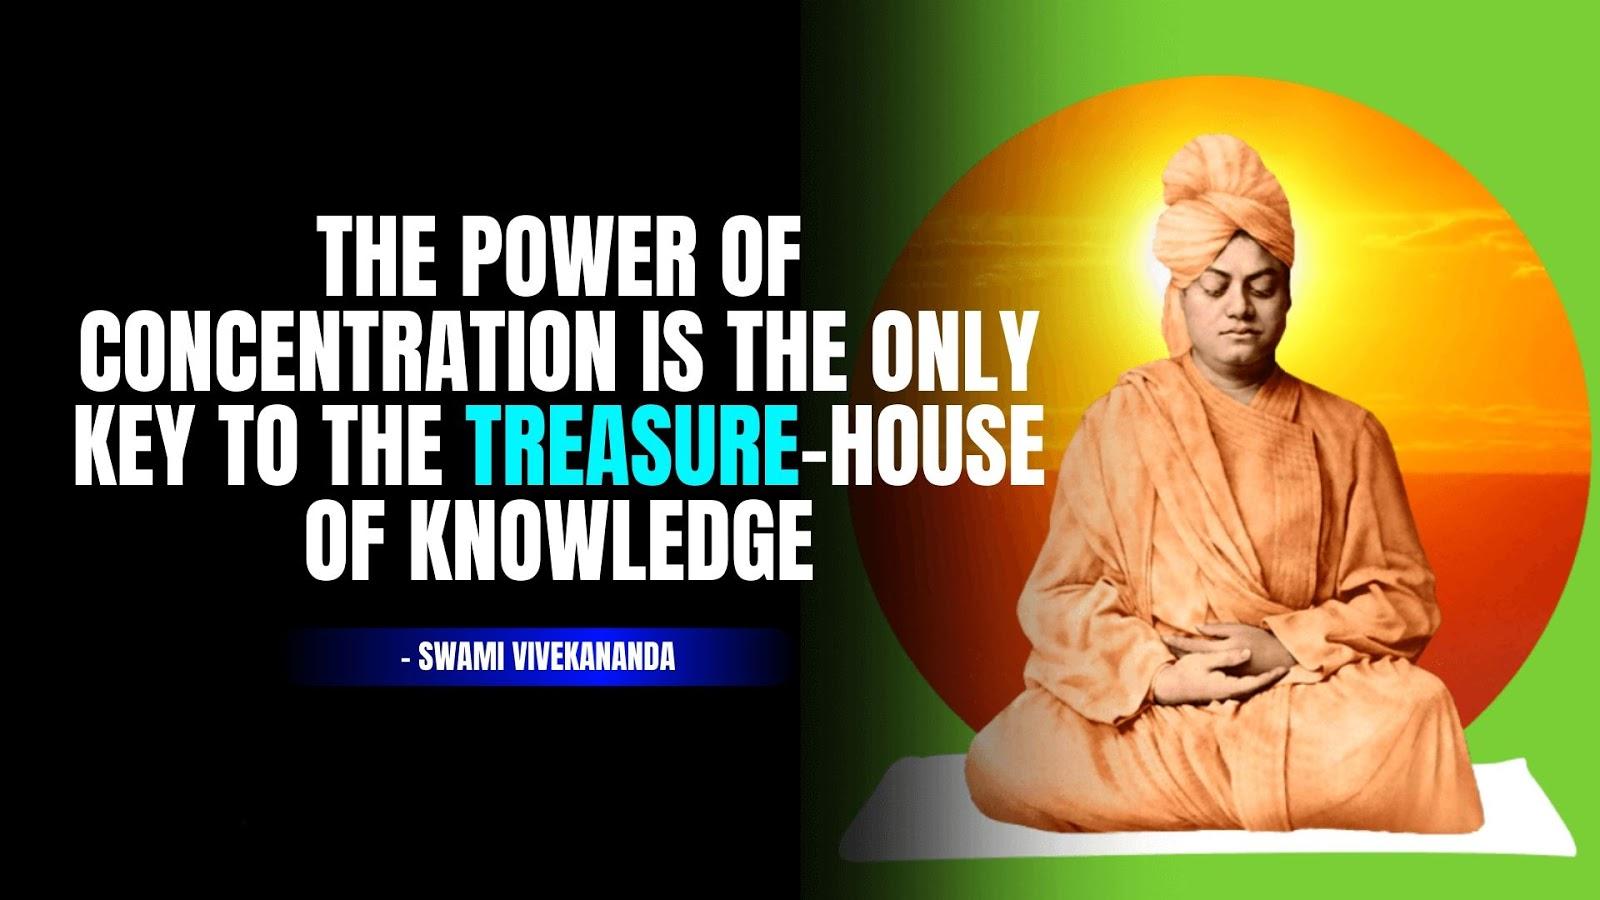 Swami Vivekananda Quotes,  Swami Vivekananda Quotes About Life,  Swami Vivekananda Quotes About Education